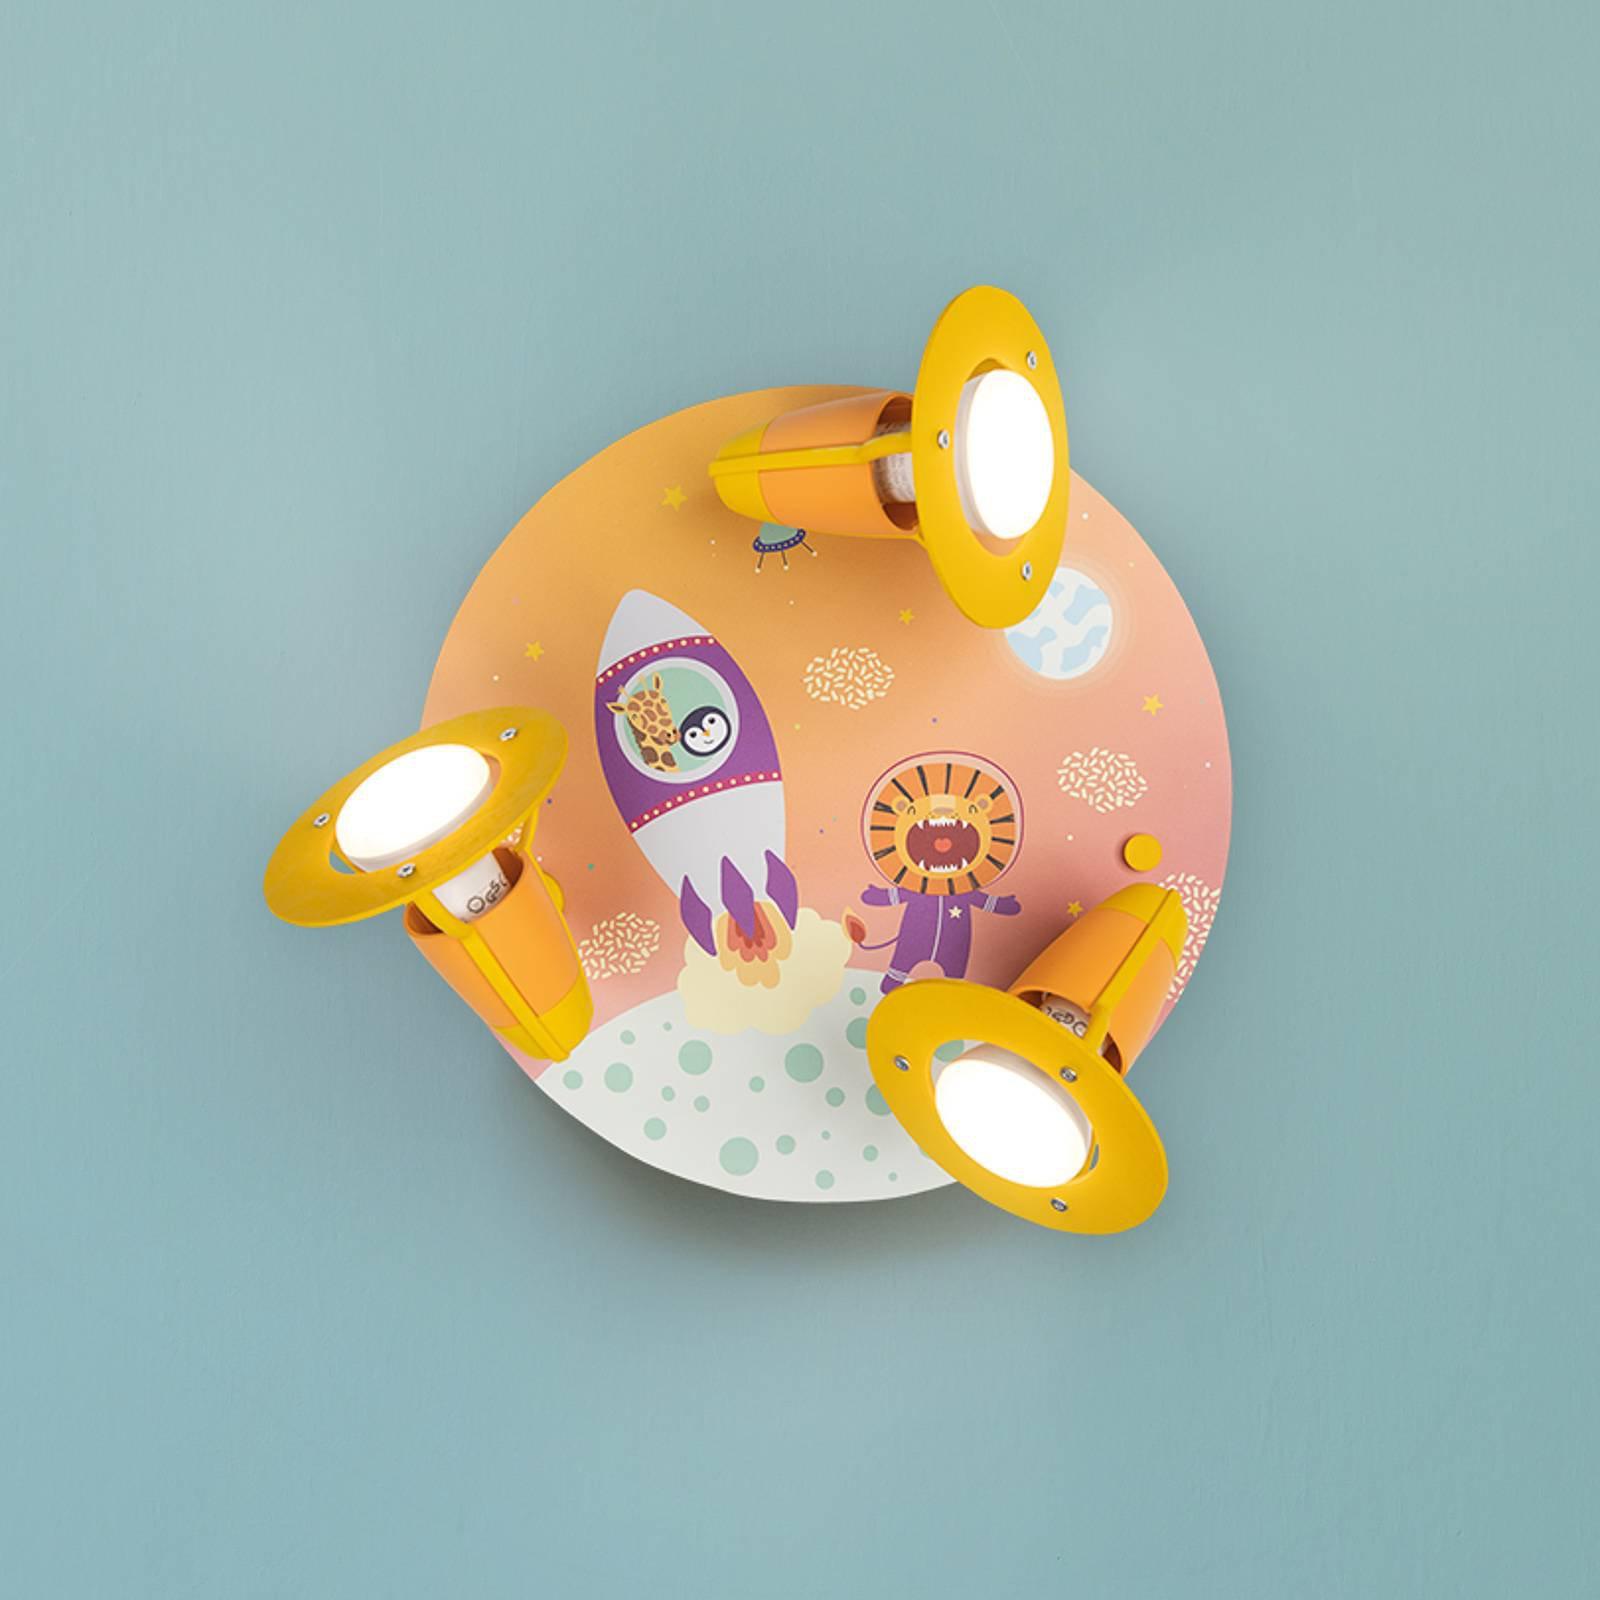 Taklampe Rondell Escape, oransje, 3 lyskilder